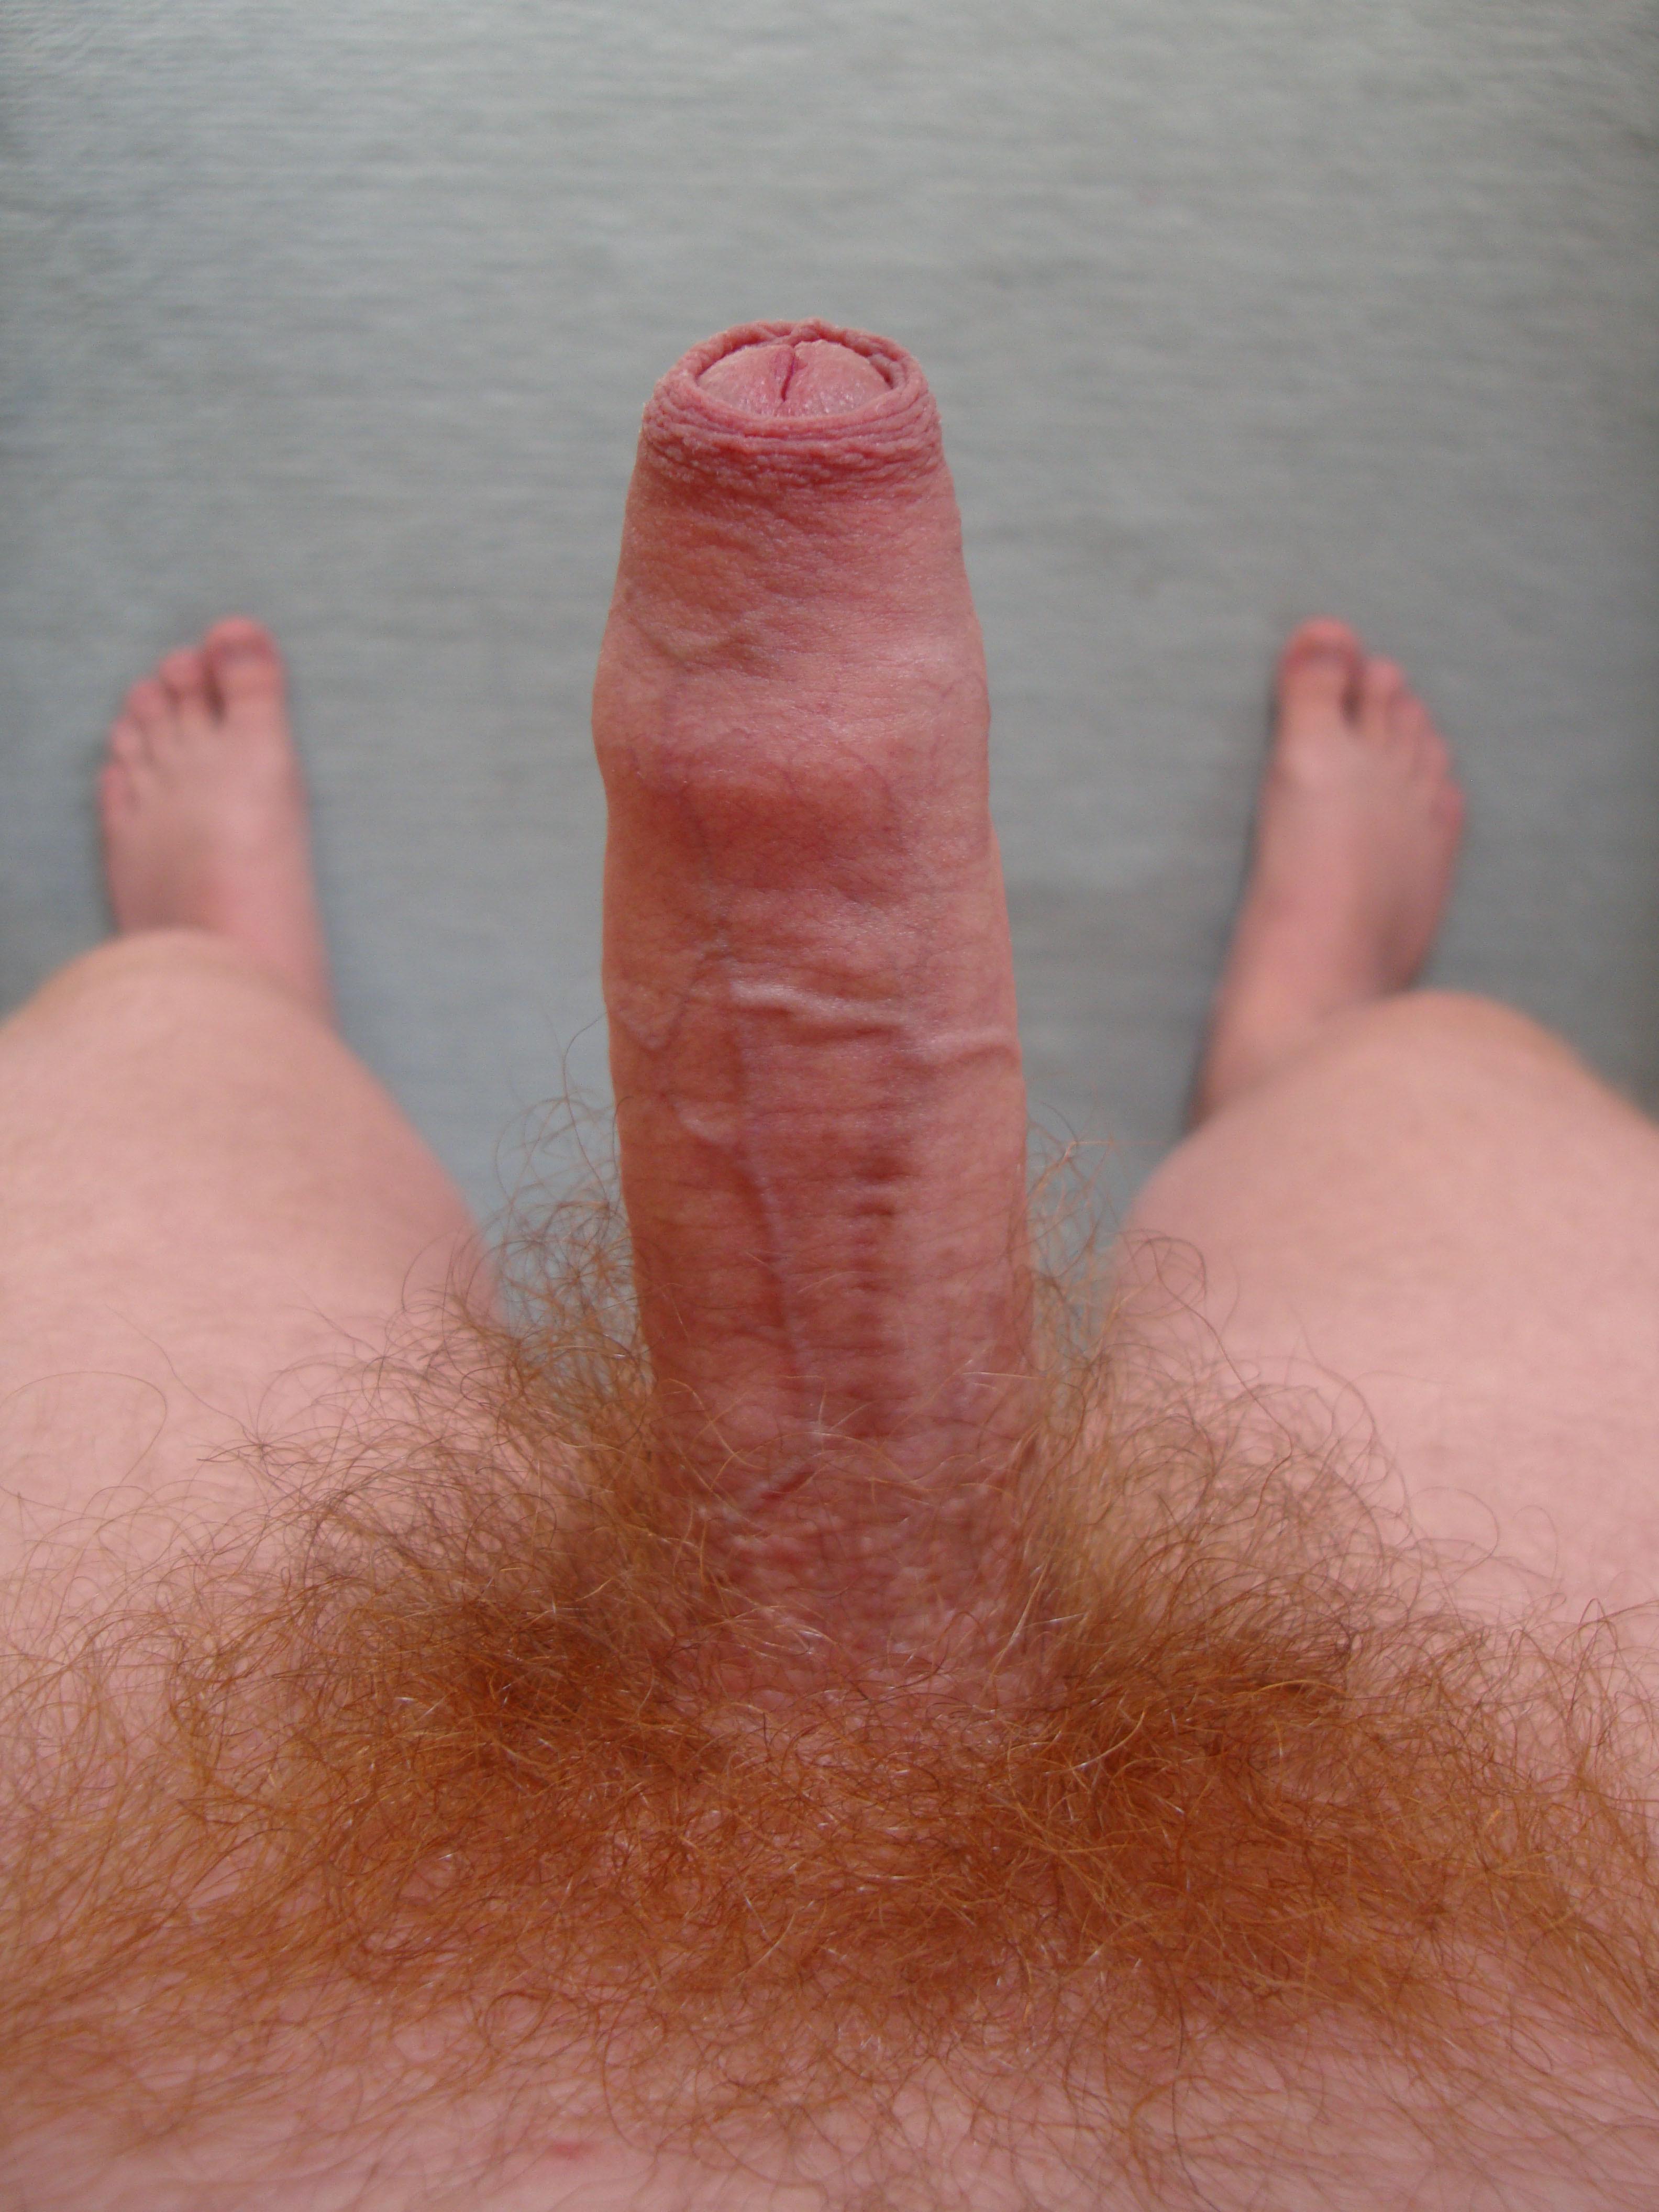 Uncut Ginger Cock